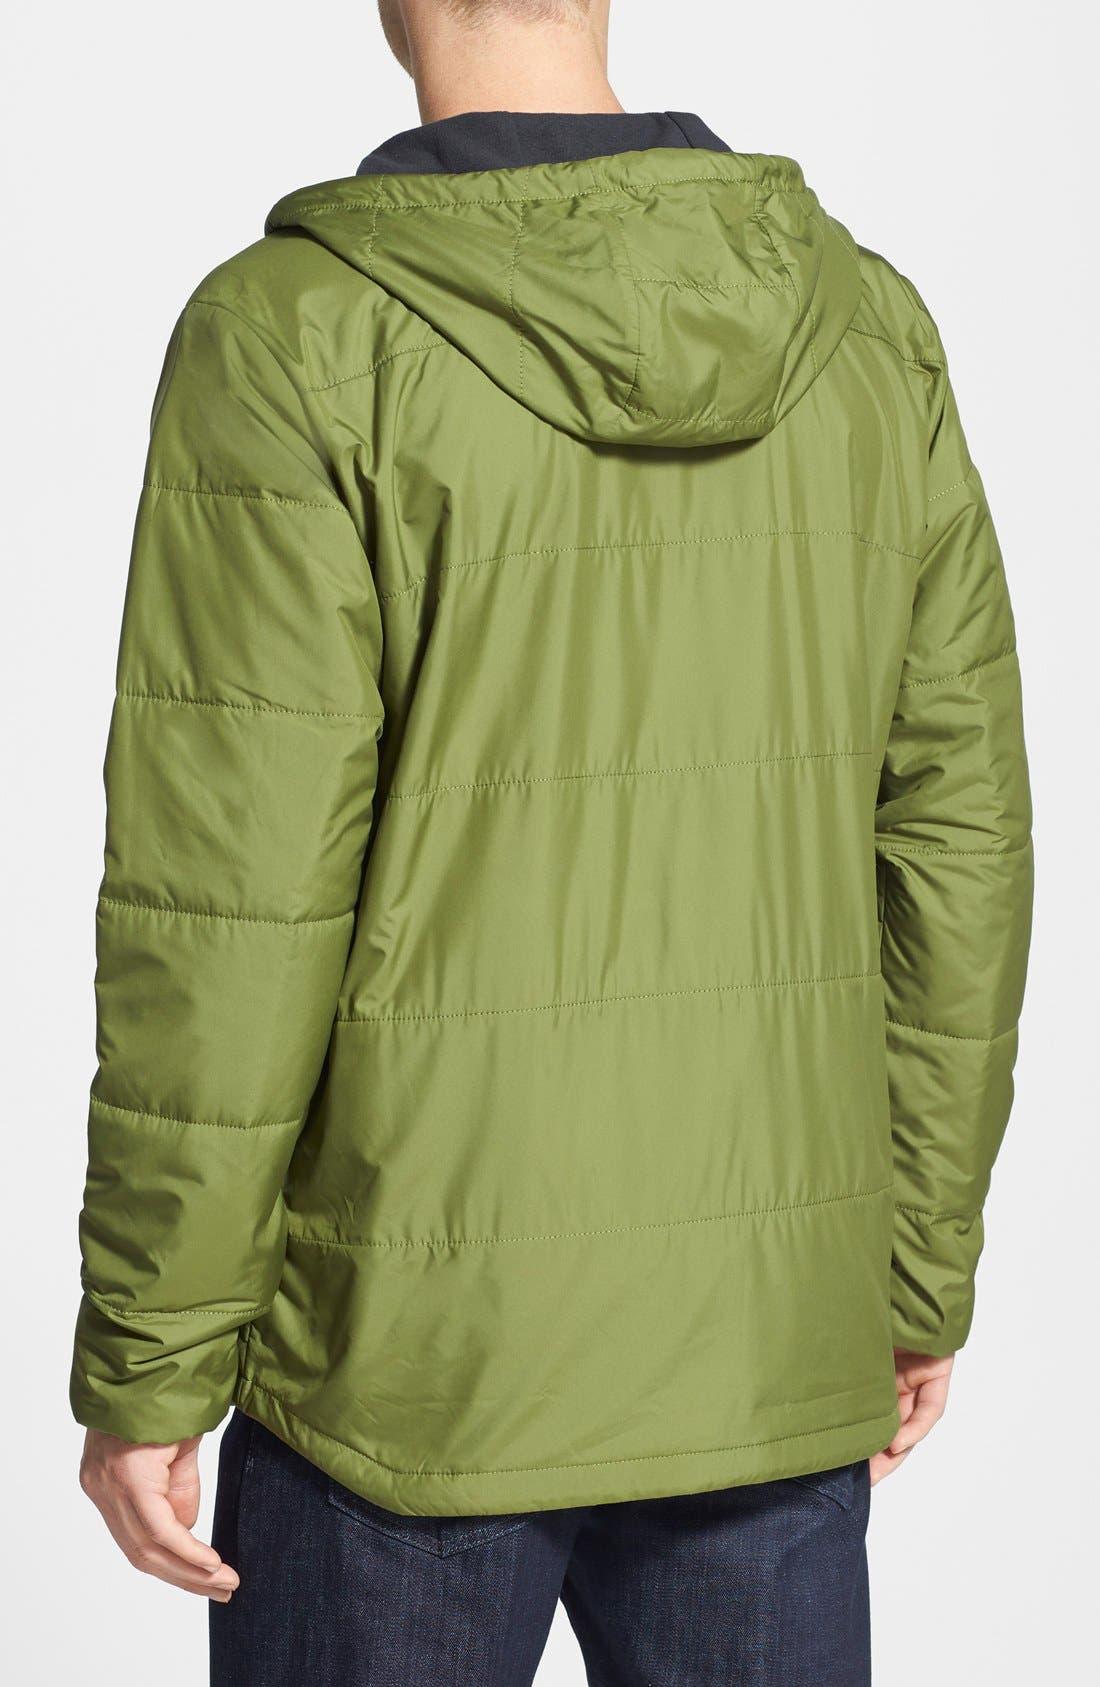 Alternate Image 2  - The North Face 'Meeks' Water Resistant Heatseeker Insulated Jacket